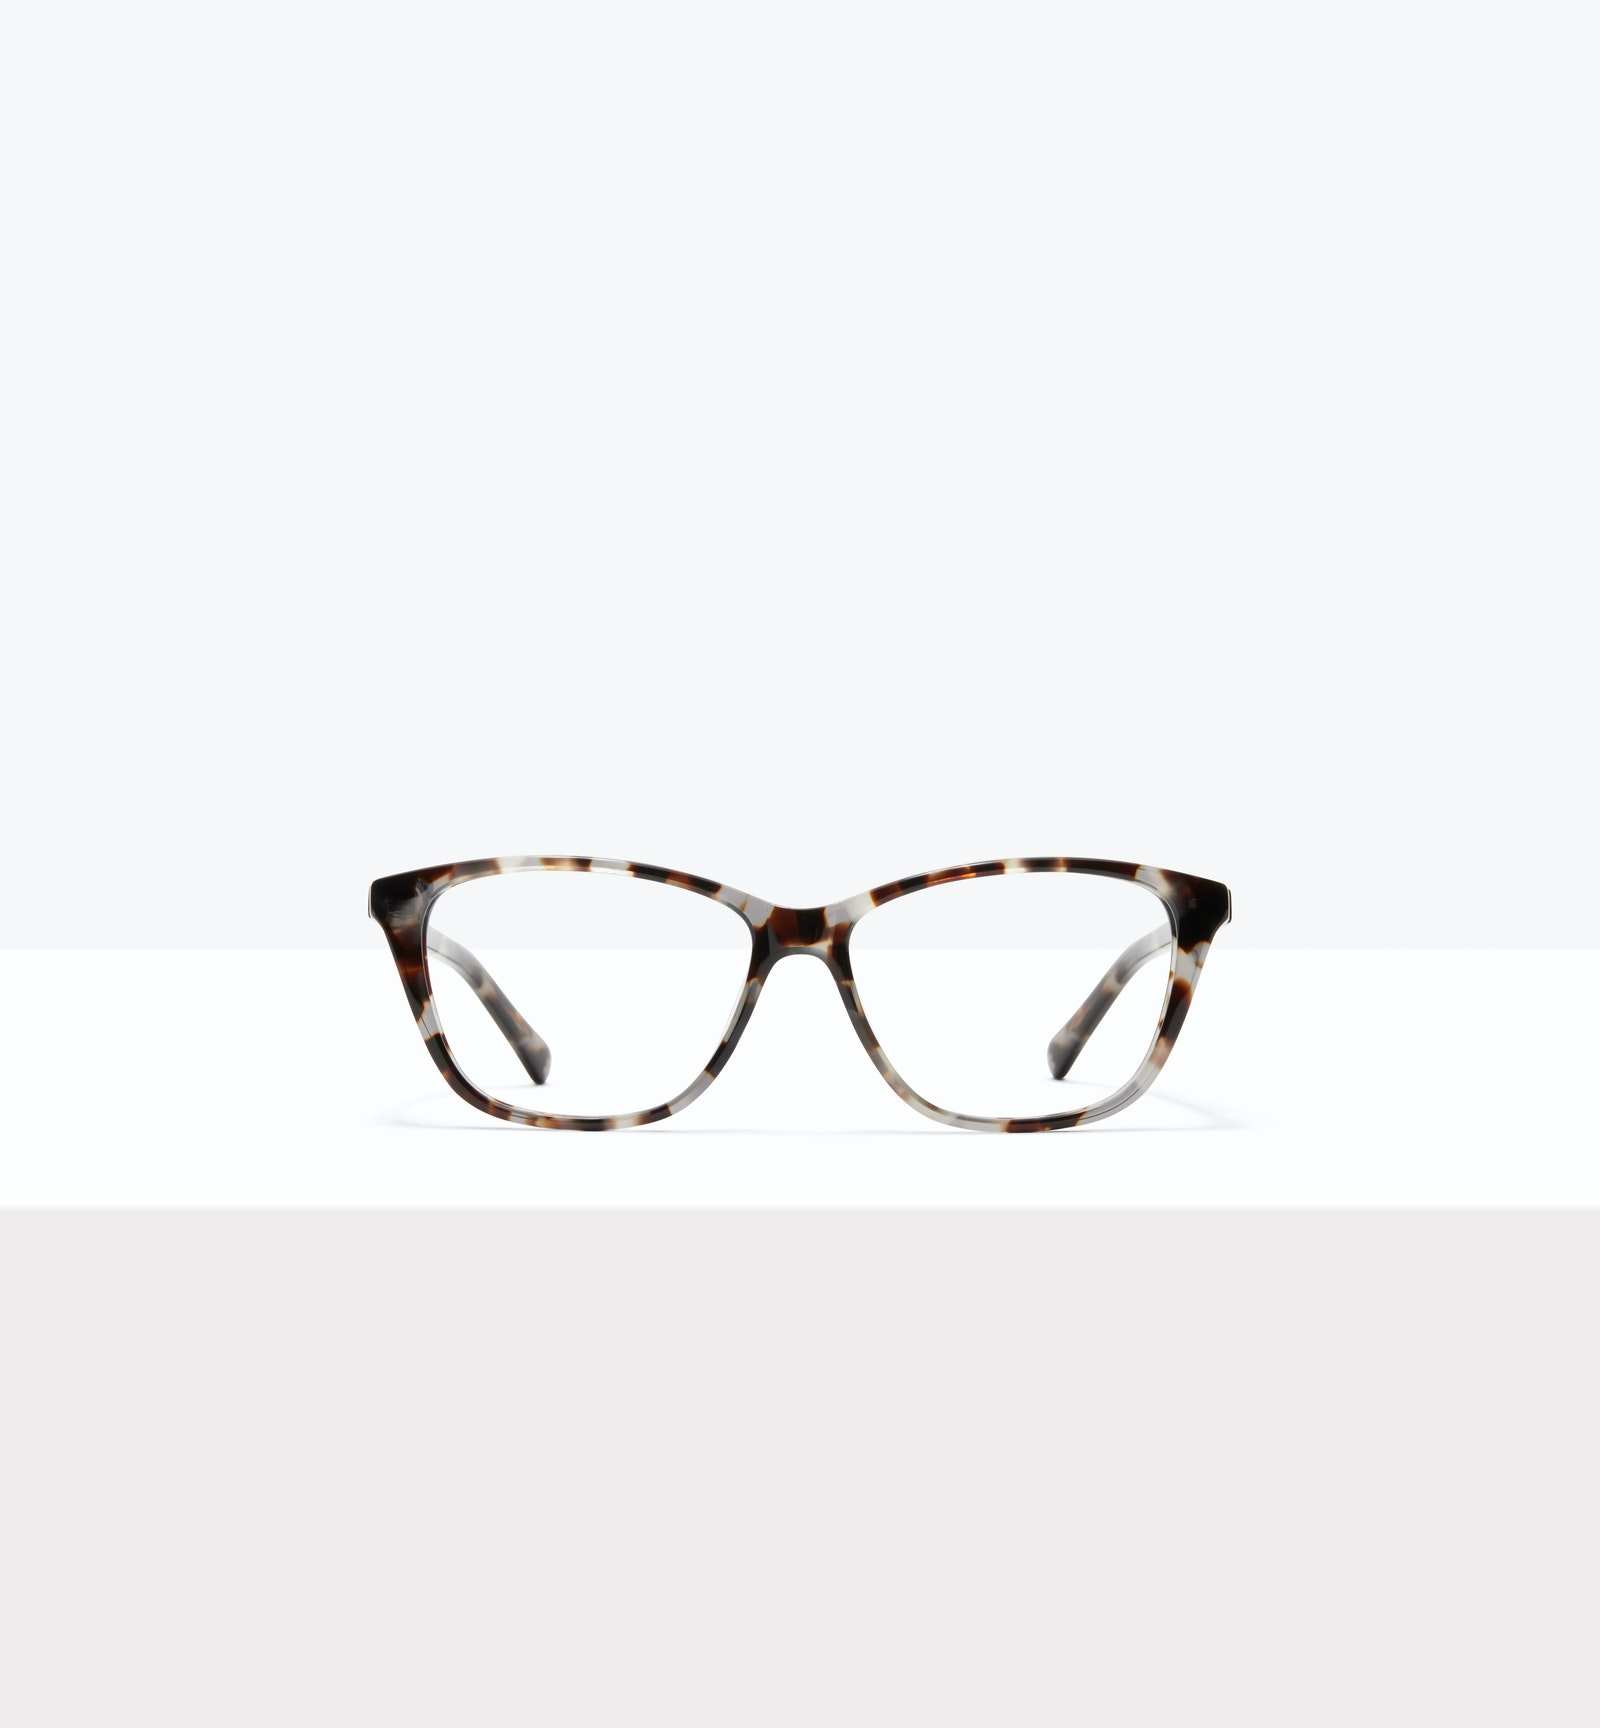 Affordable Fashion Glasses Cat Eye Rectangle Eyeglasses Women Myrtle M Blue Tort